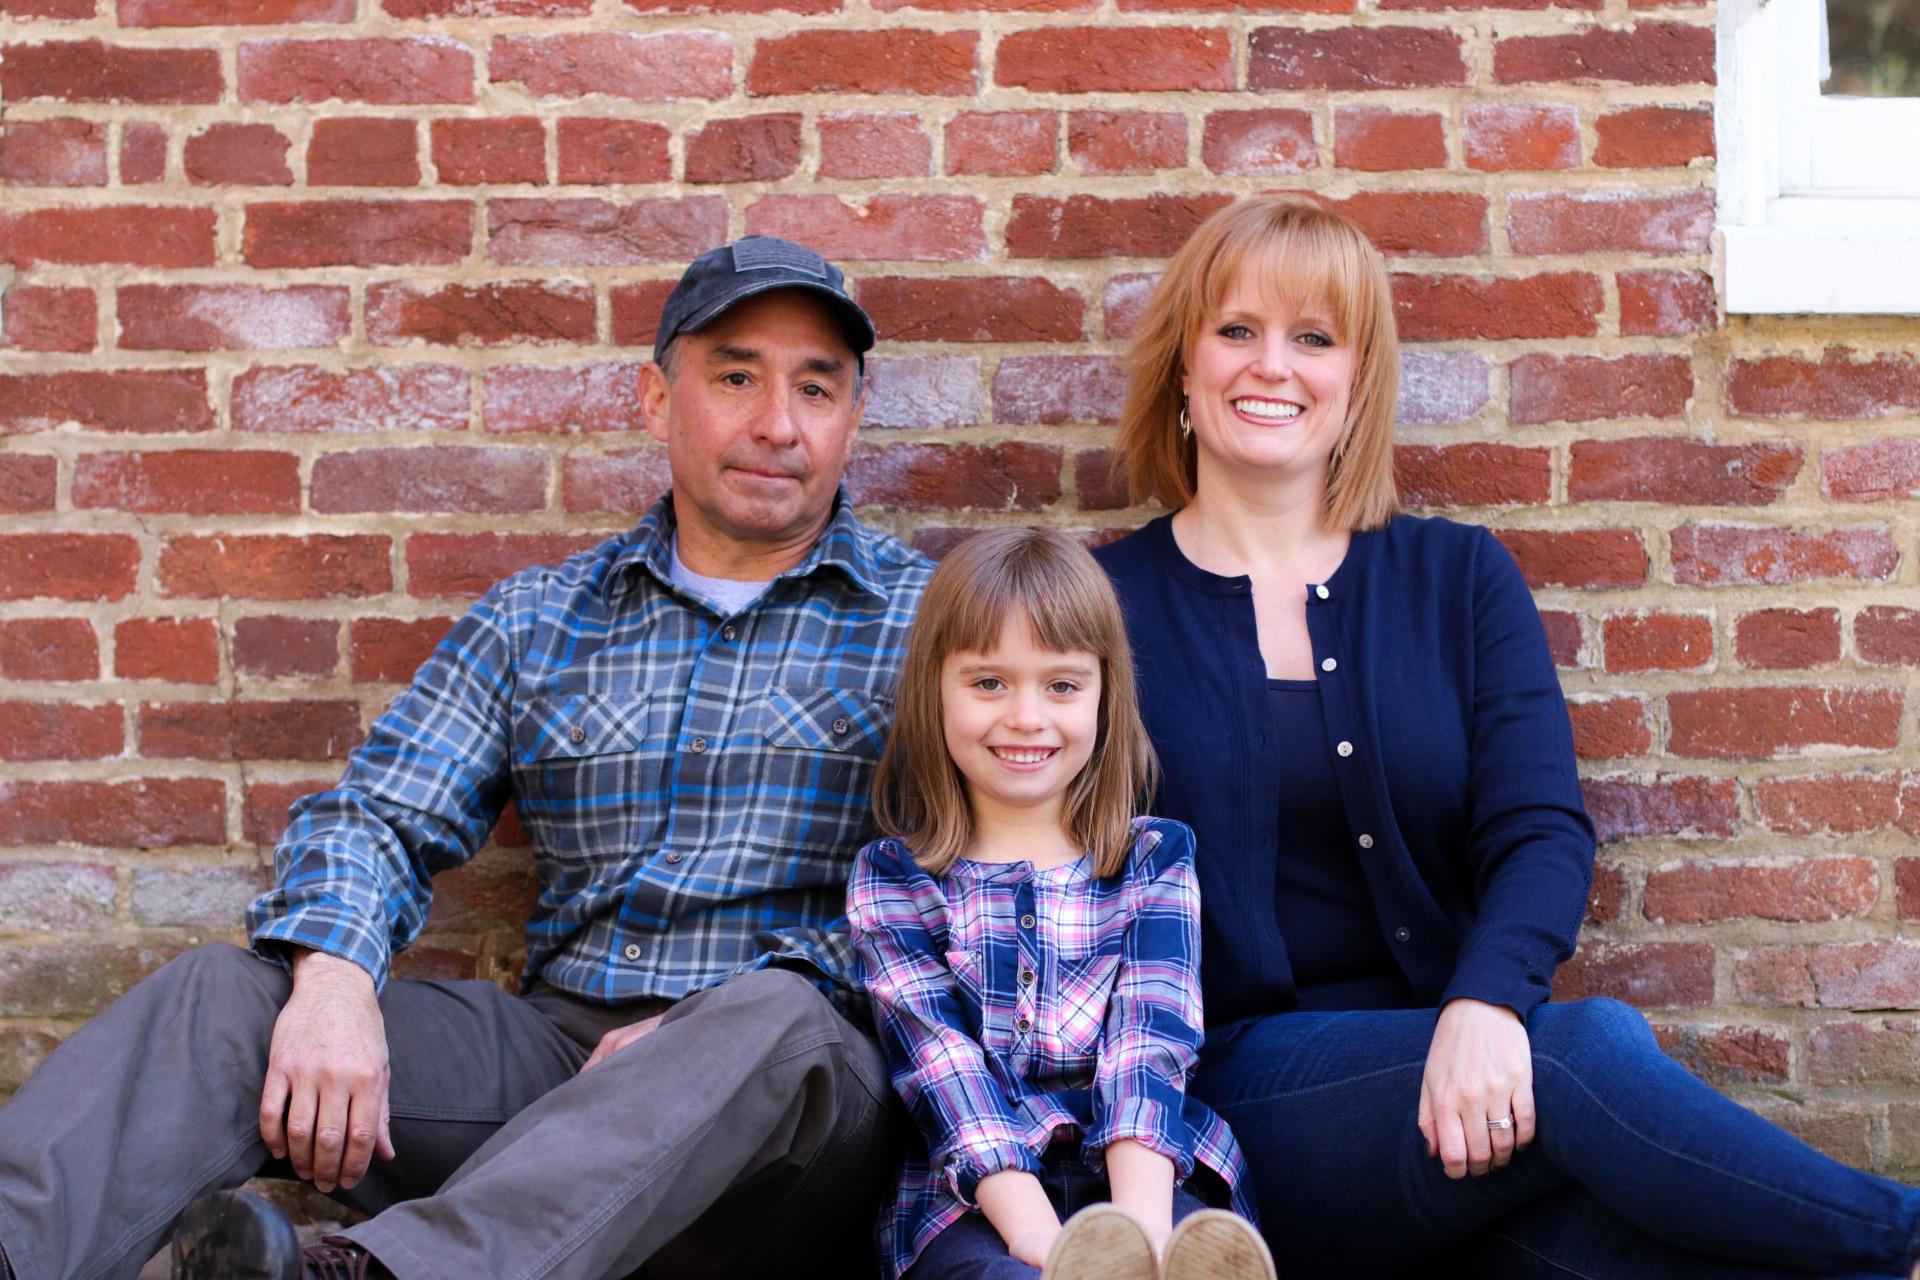 Thank you for voting Tuesday, November 6!  - Kari Nacy & Family